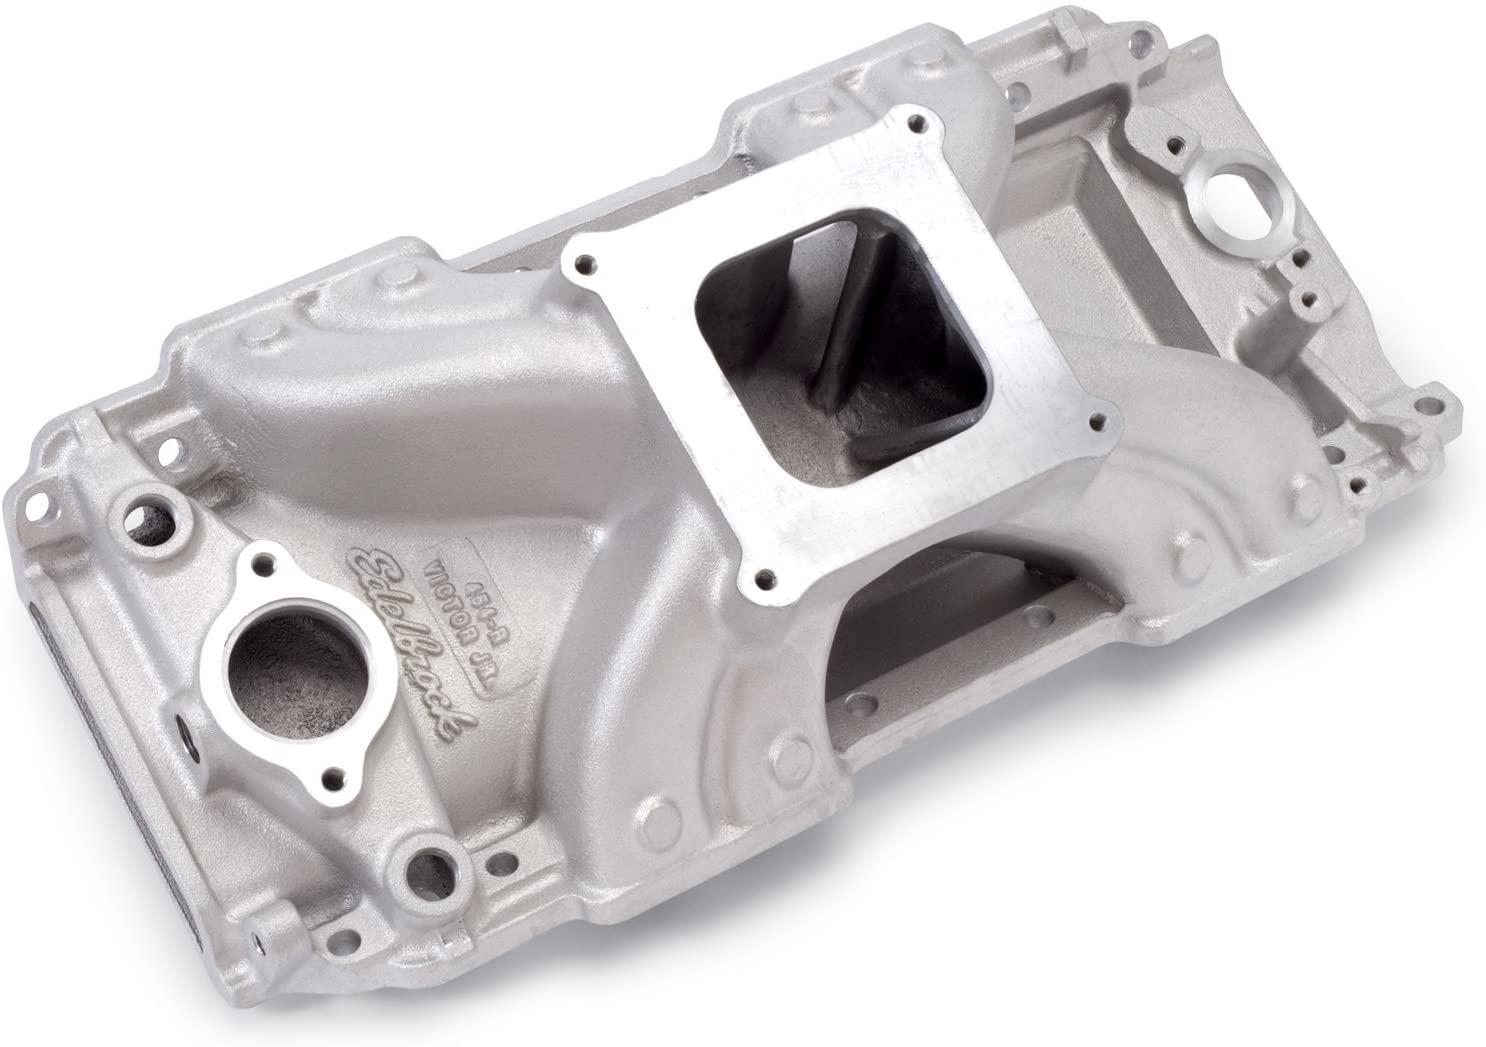 Edelbrock 2902 Victor Junior Aluminum Intake Manifold